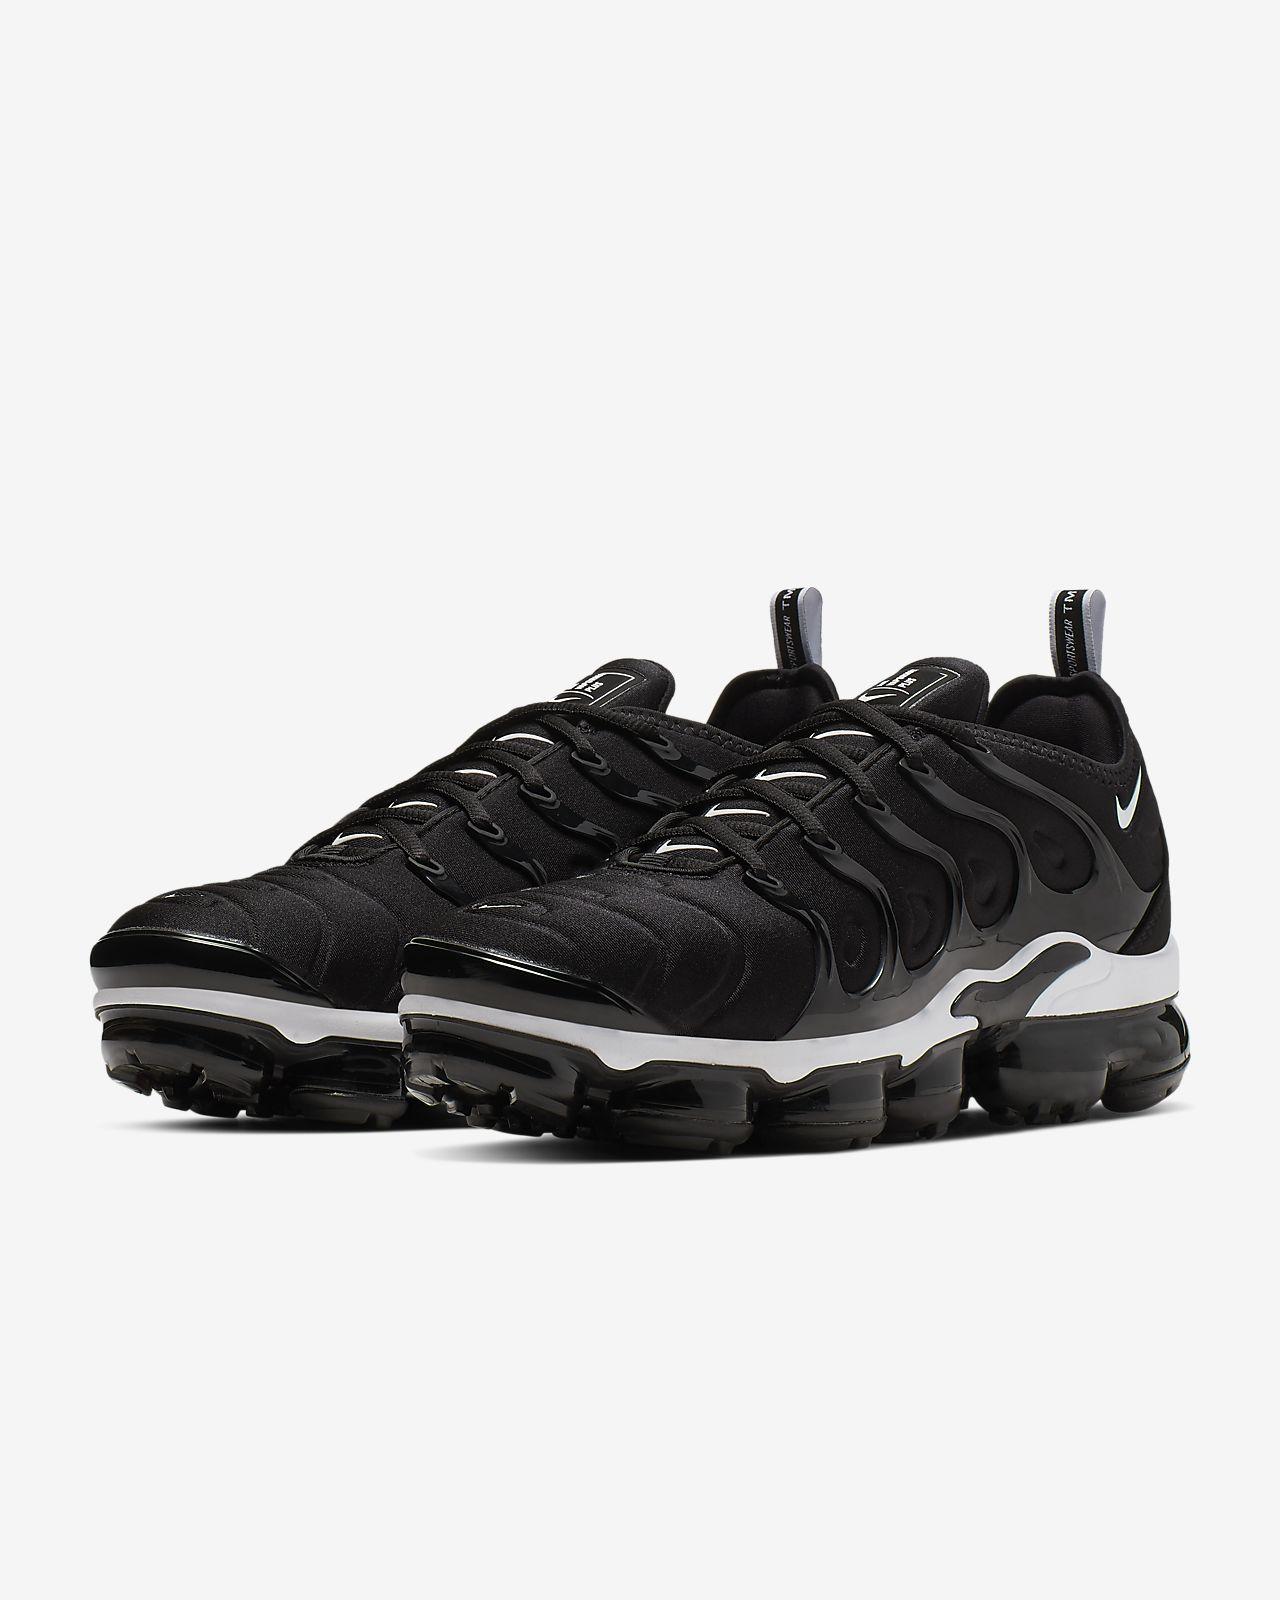 sneakers for cheap 8abd9 3205e ... Chaussure Nike Air VaporMax Plus pour Homme